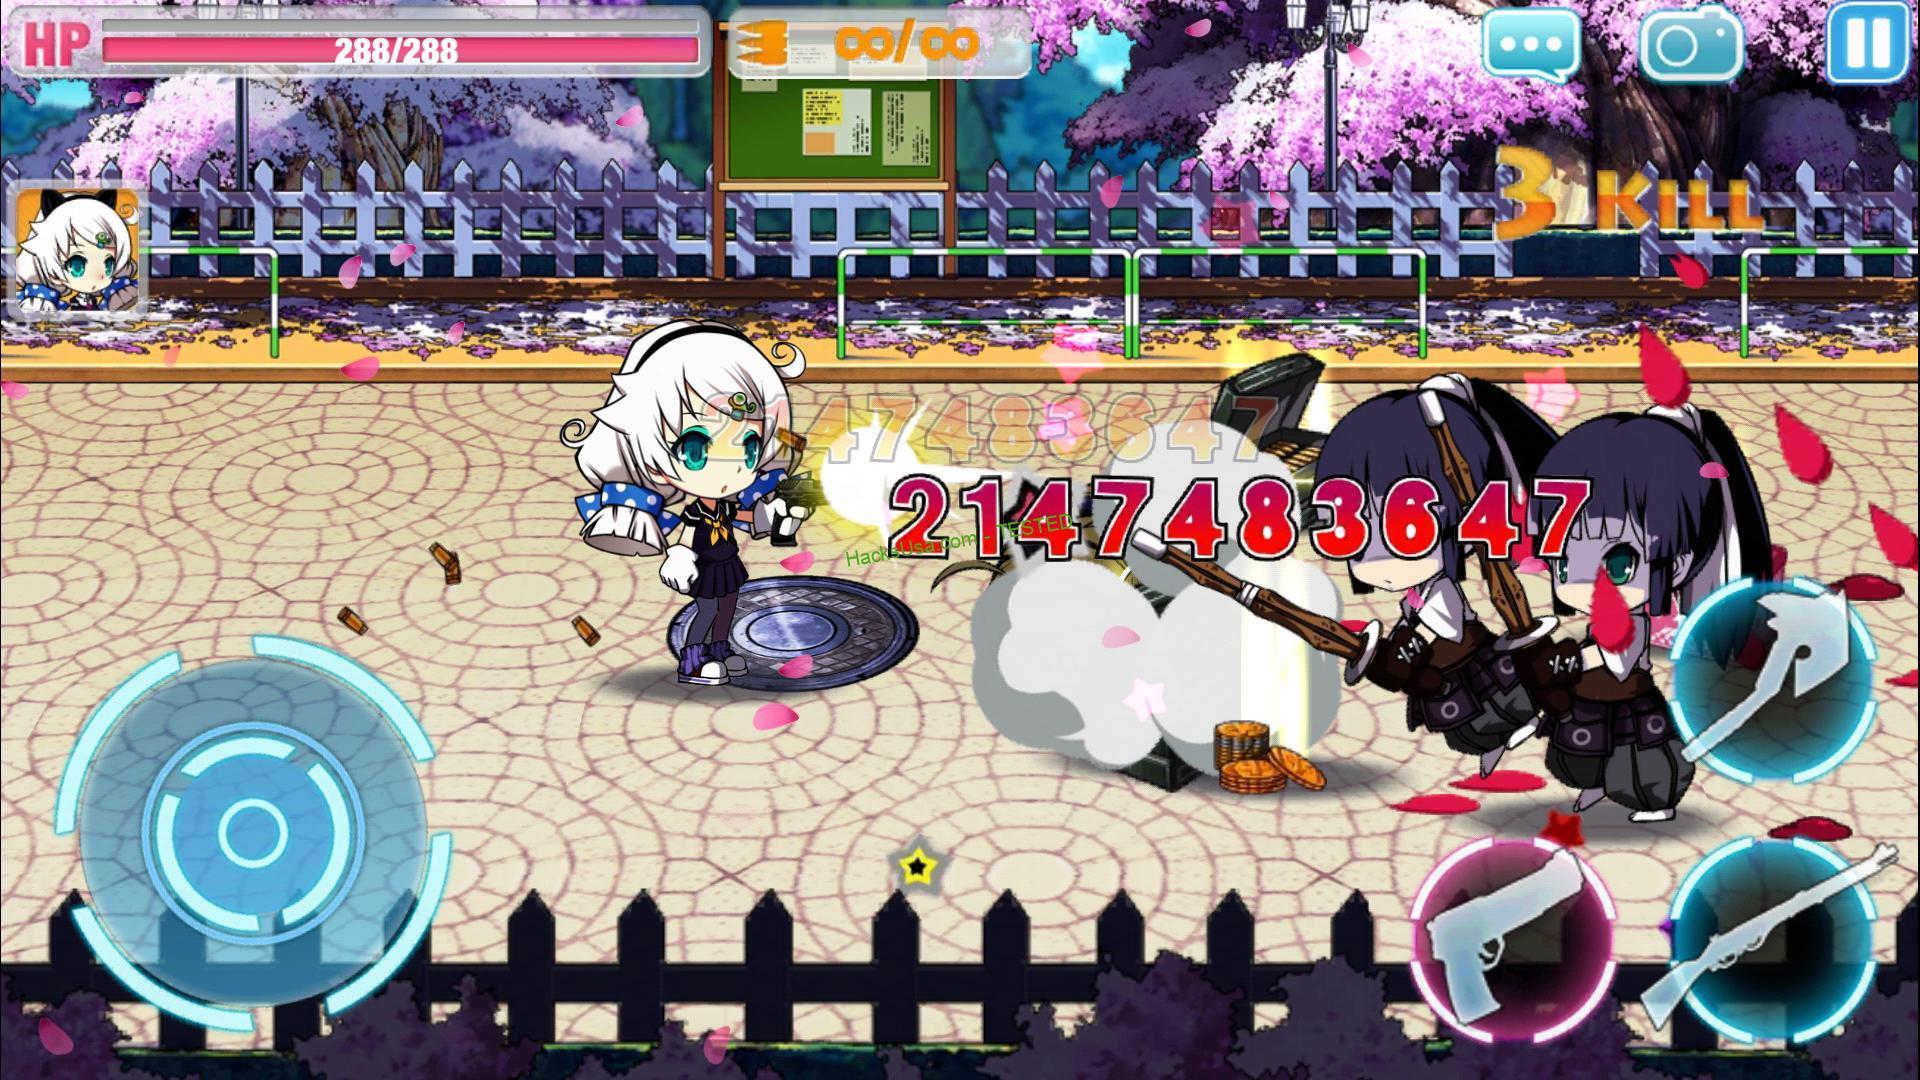 MOD Guns Girl Infinite Ammo – Honkai Gakuen God Mode – VER. 5.4.22